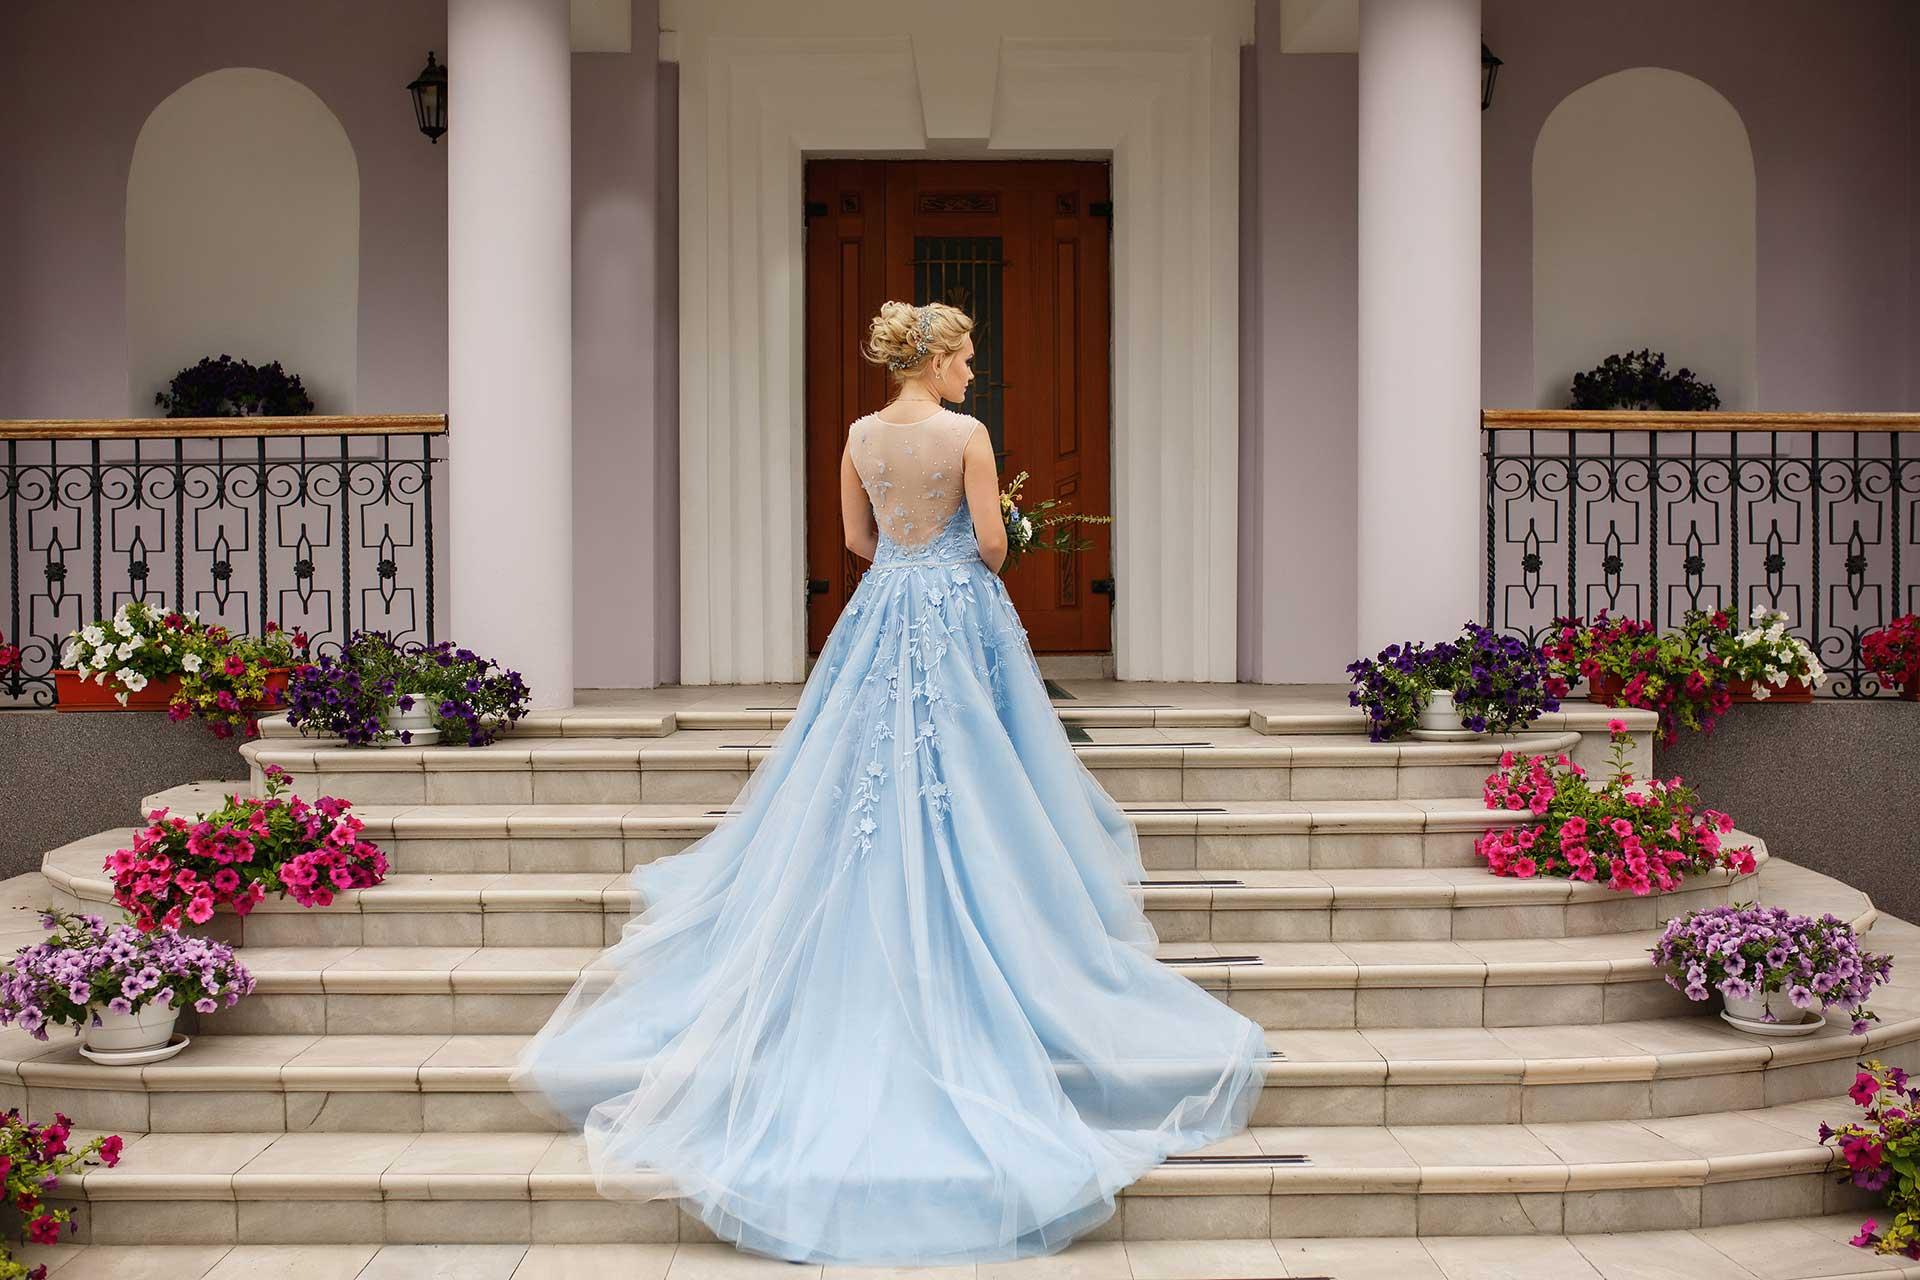 Blue Brides - New year, New bride!